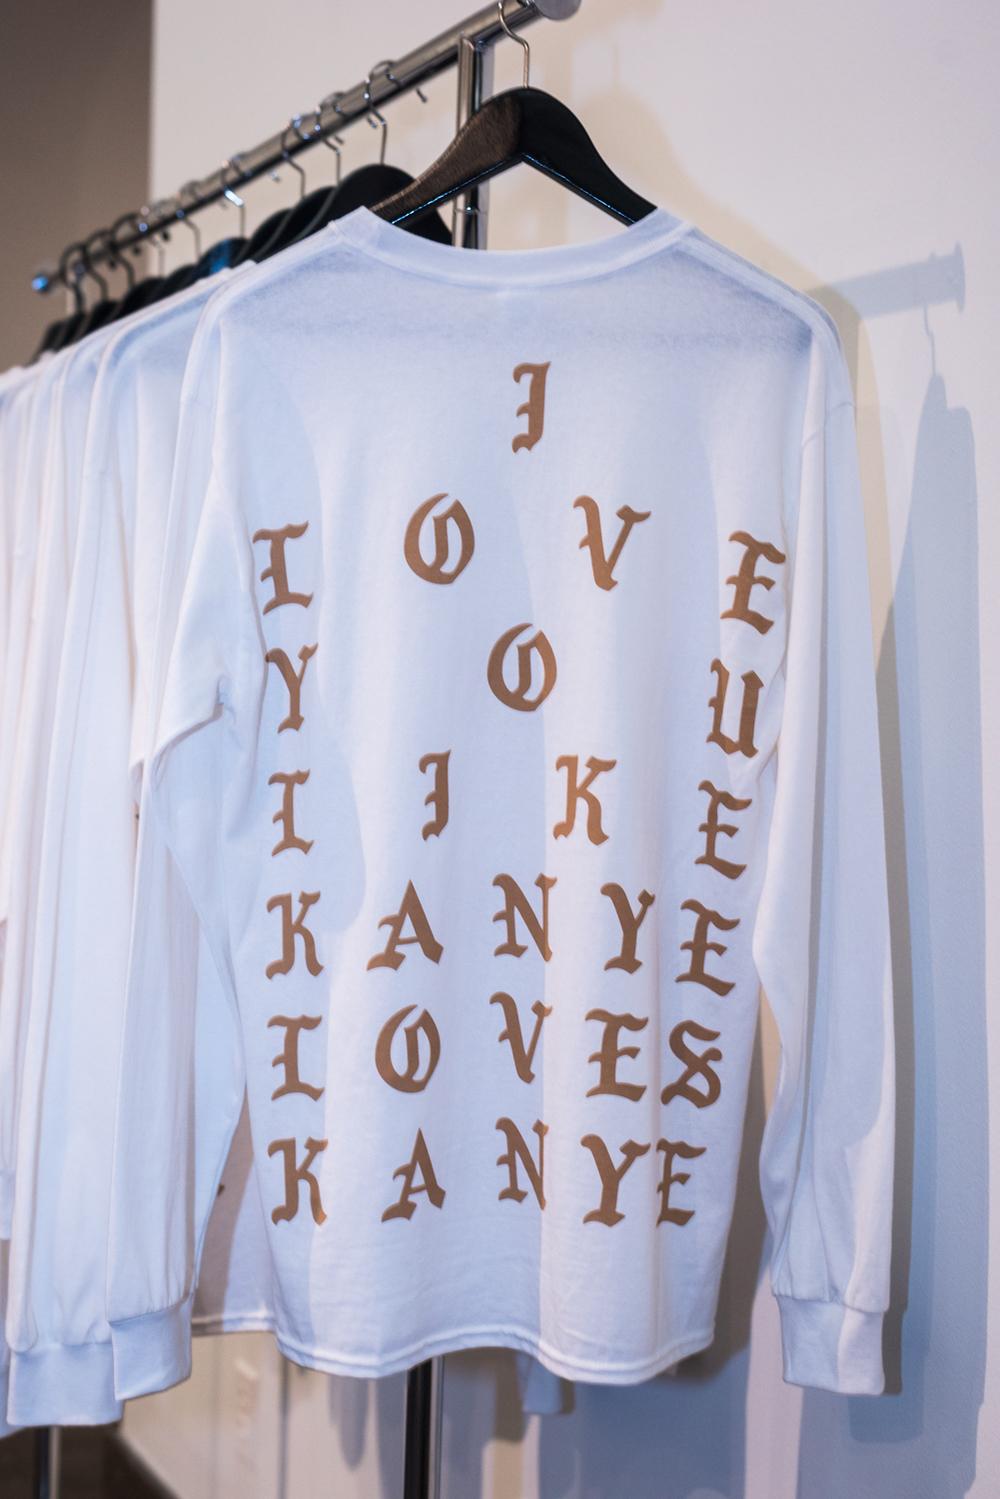 Kanye_Popup-Miami-18.jpg